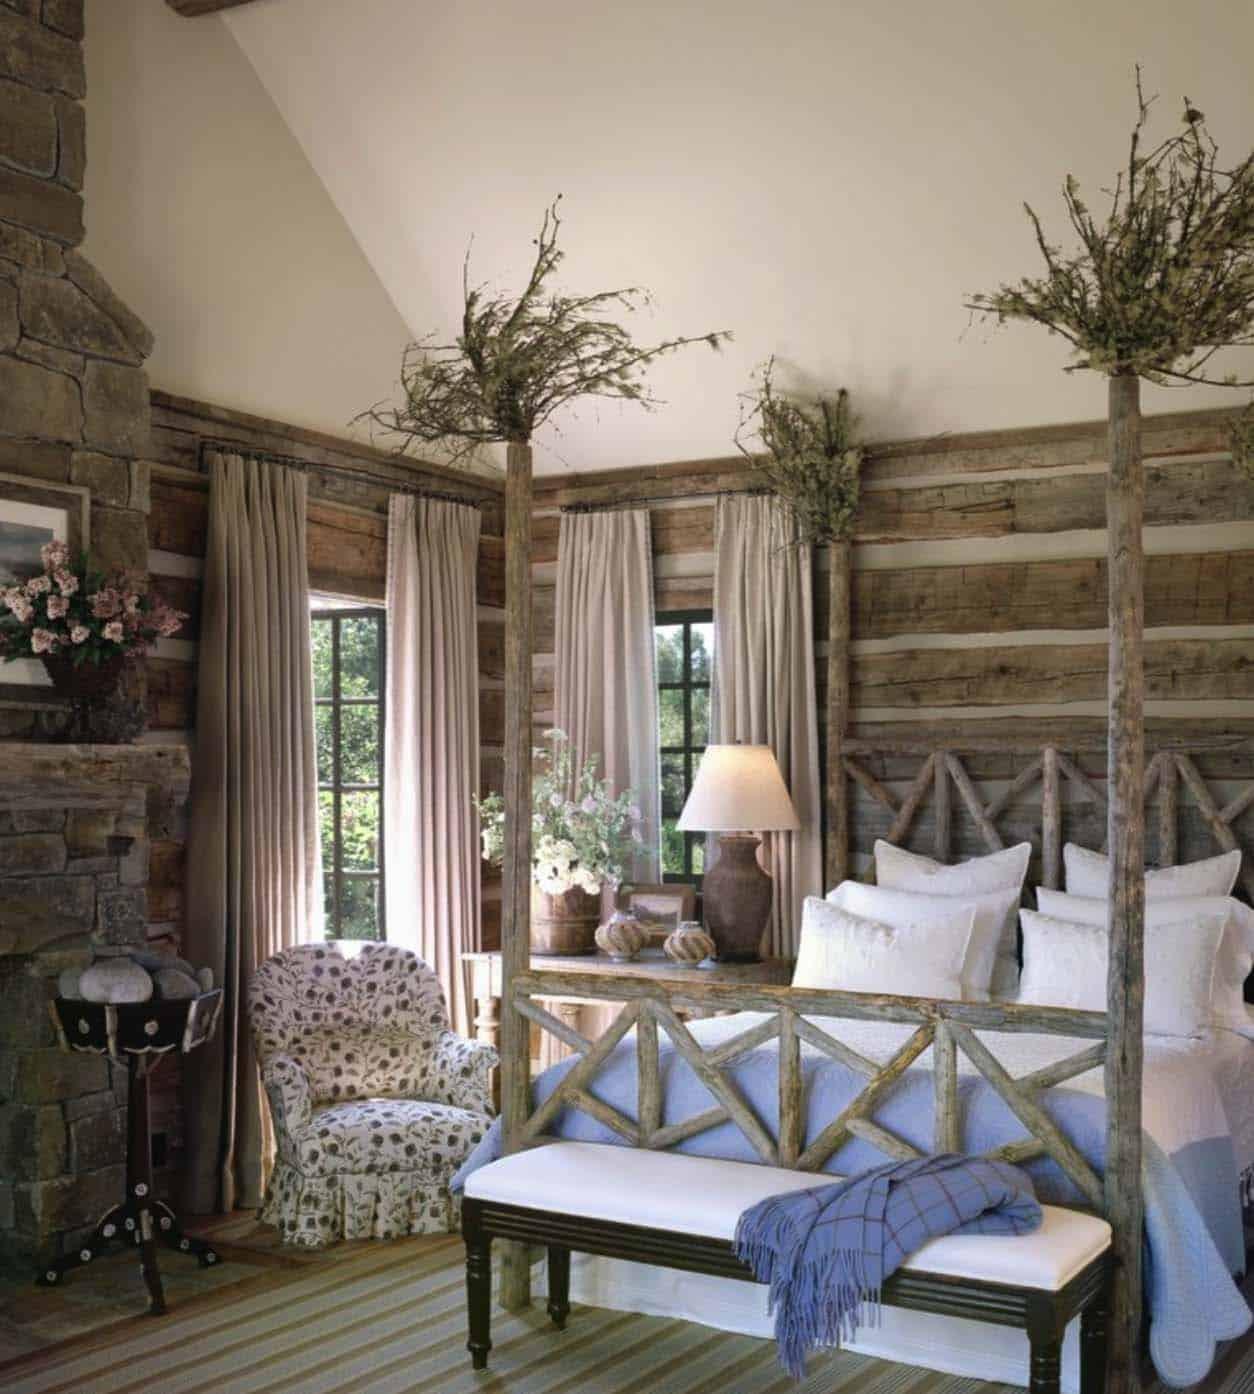 log-cabin-style-bedrooms-08-1-kindesign